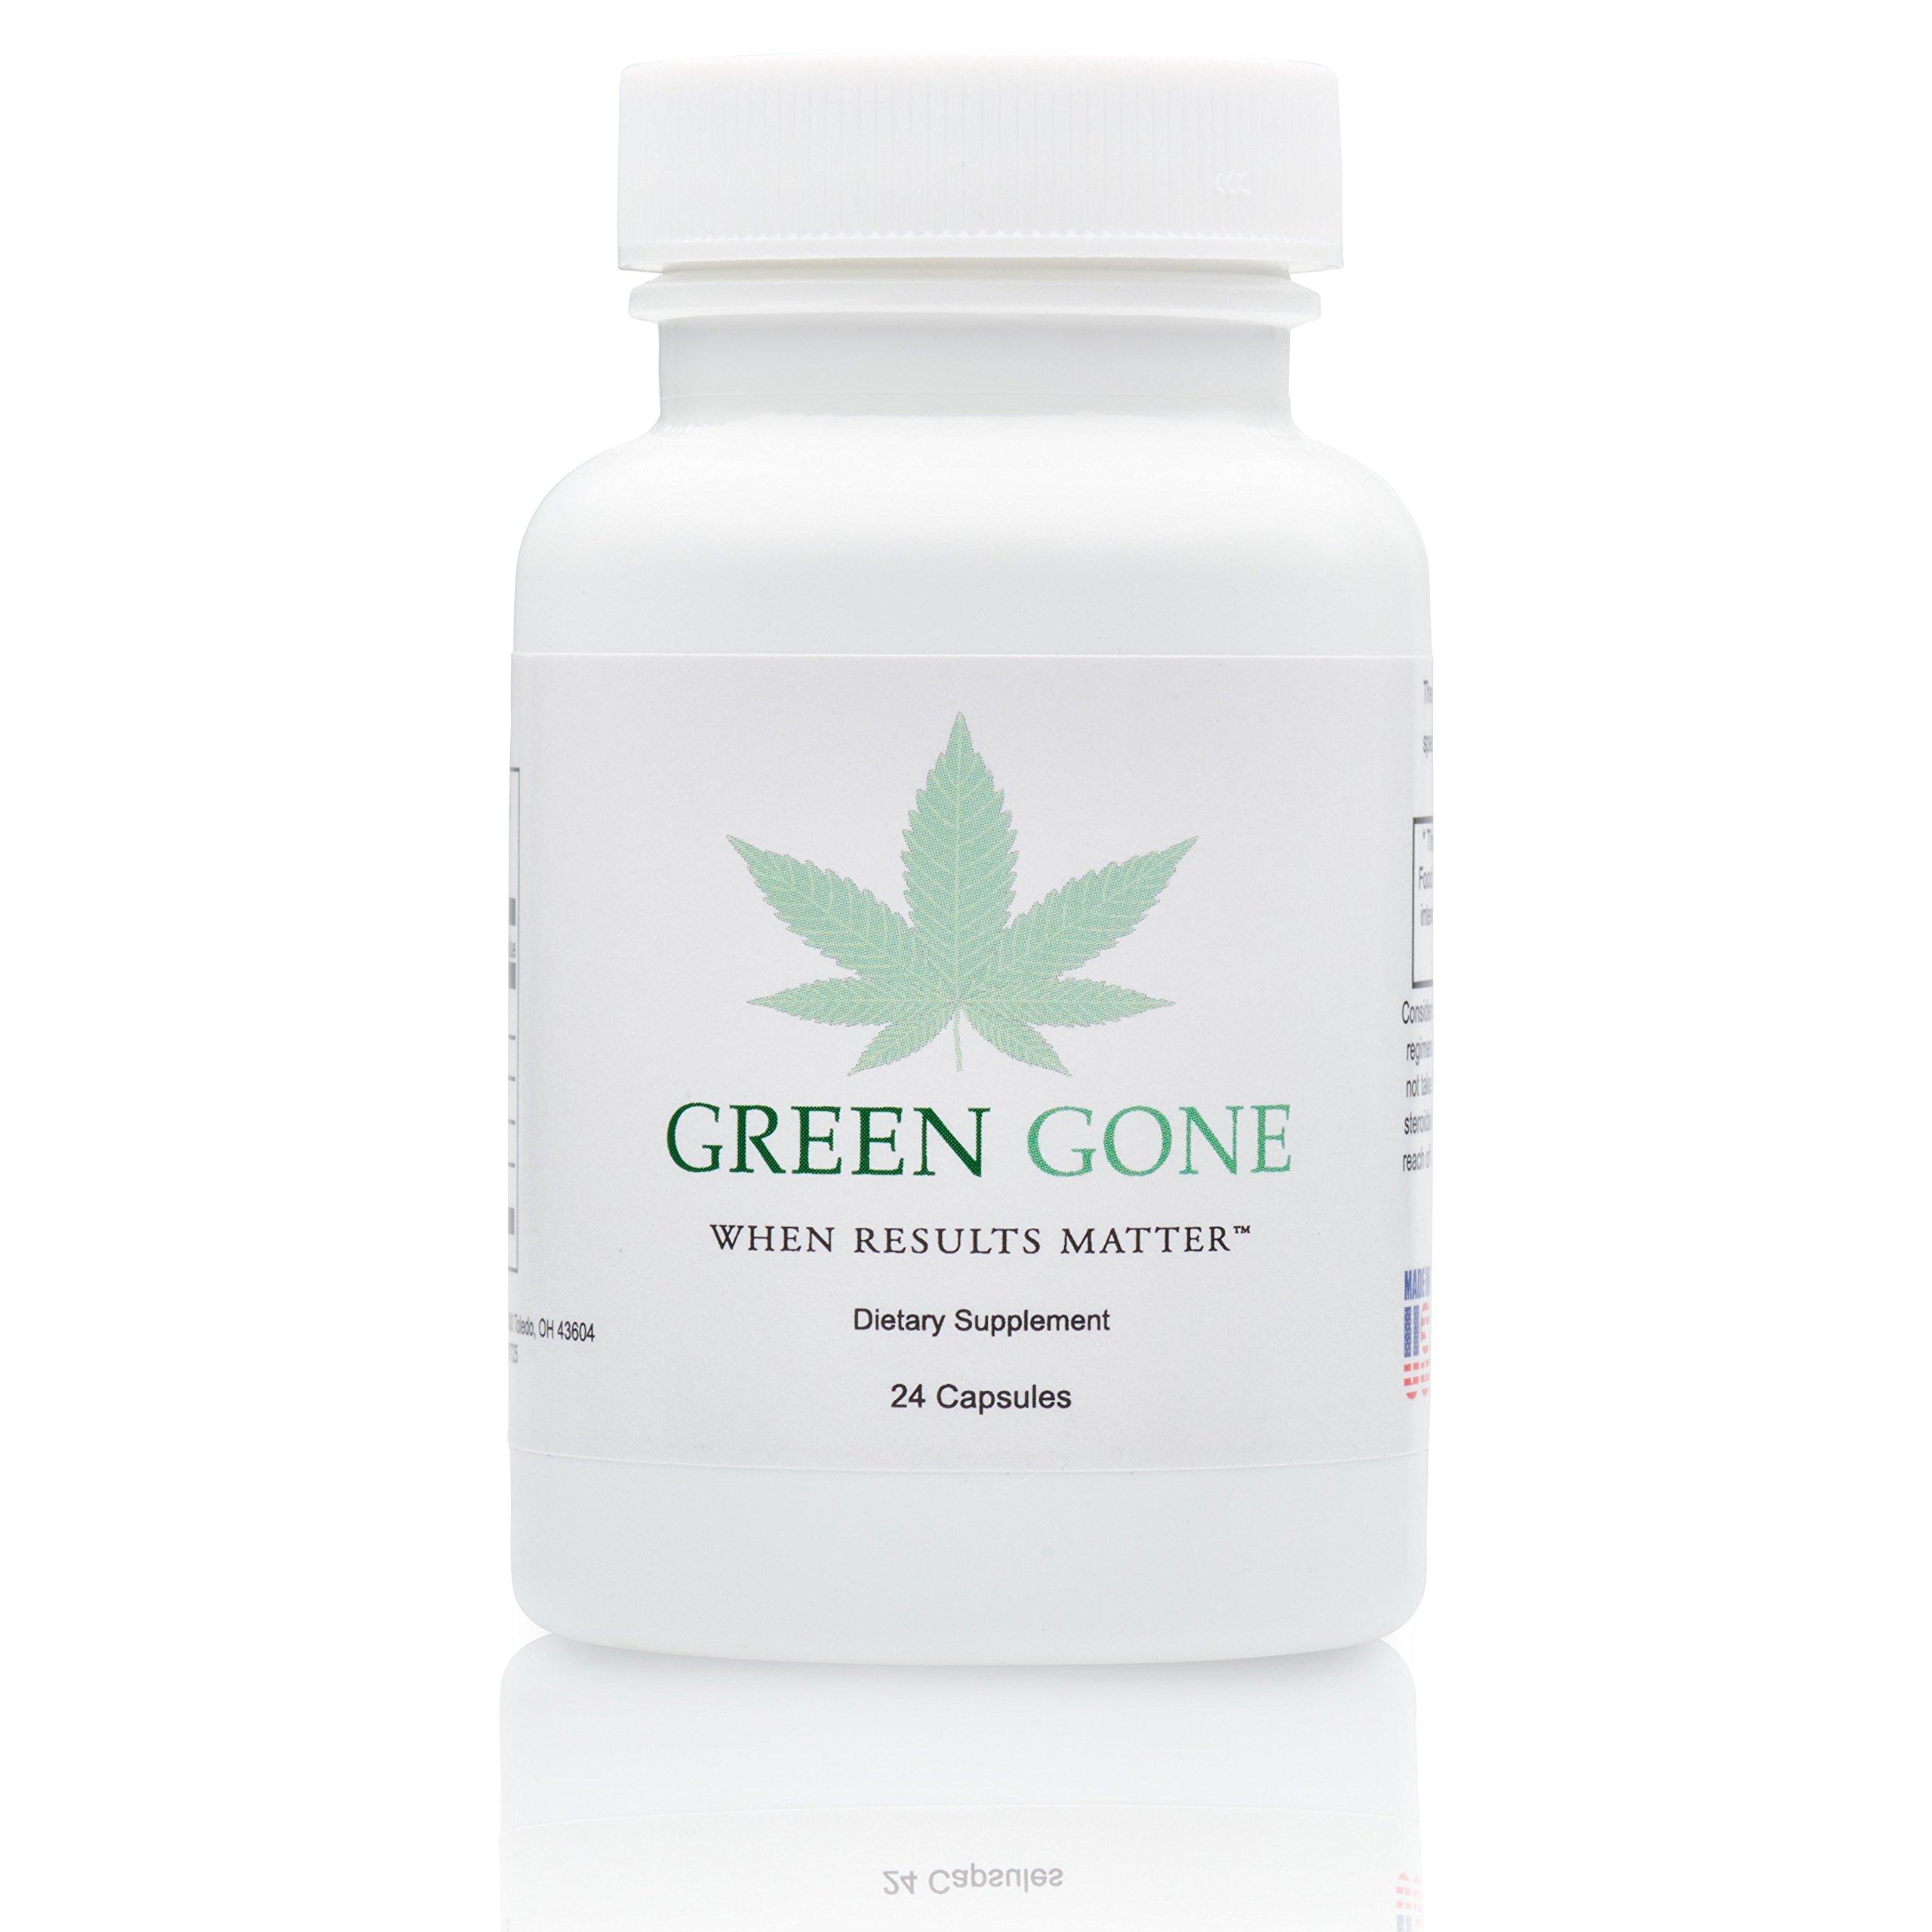 Green Gone 2 Day Emergency THC (Marijuana) Detox Kit - Permanent Cleanse, With 5 Free THC Test Strips!